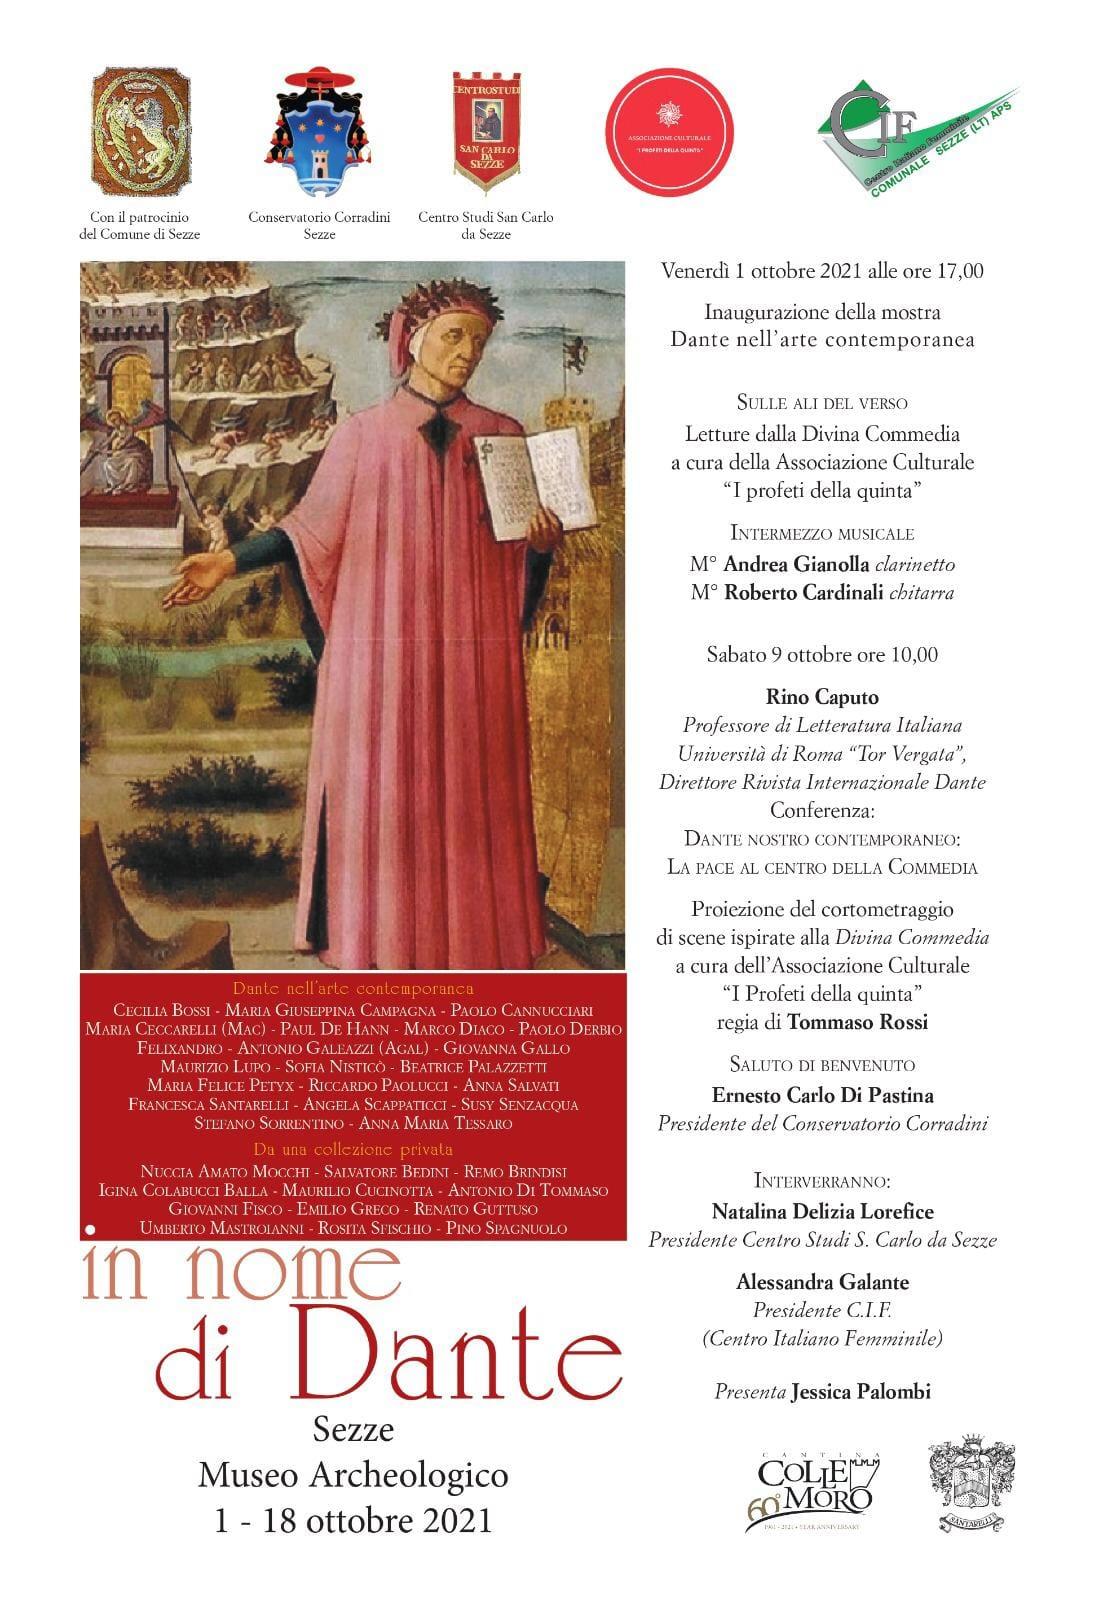 Sezze: In nome di Dante 2021 @ Museo Archeologico Sezze